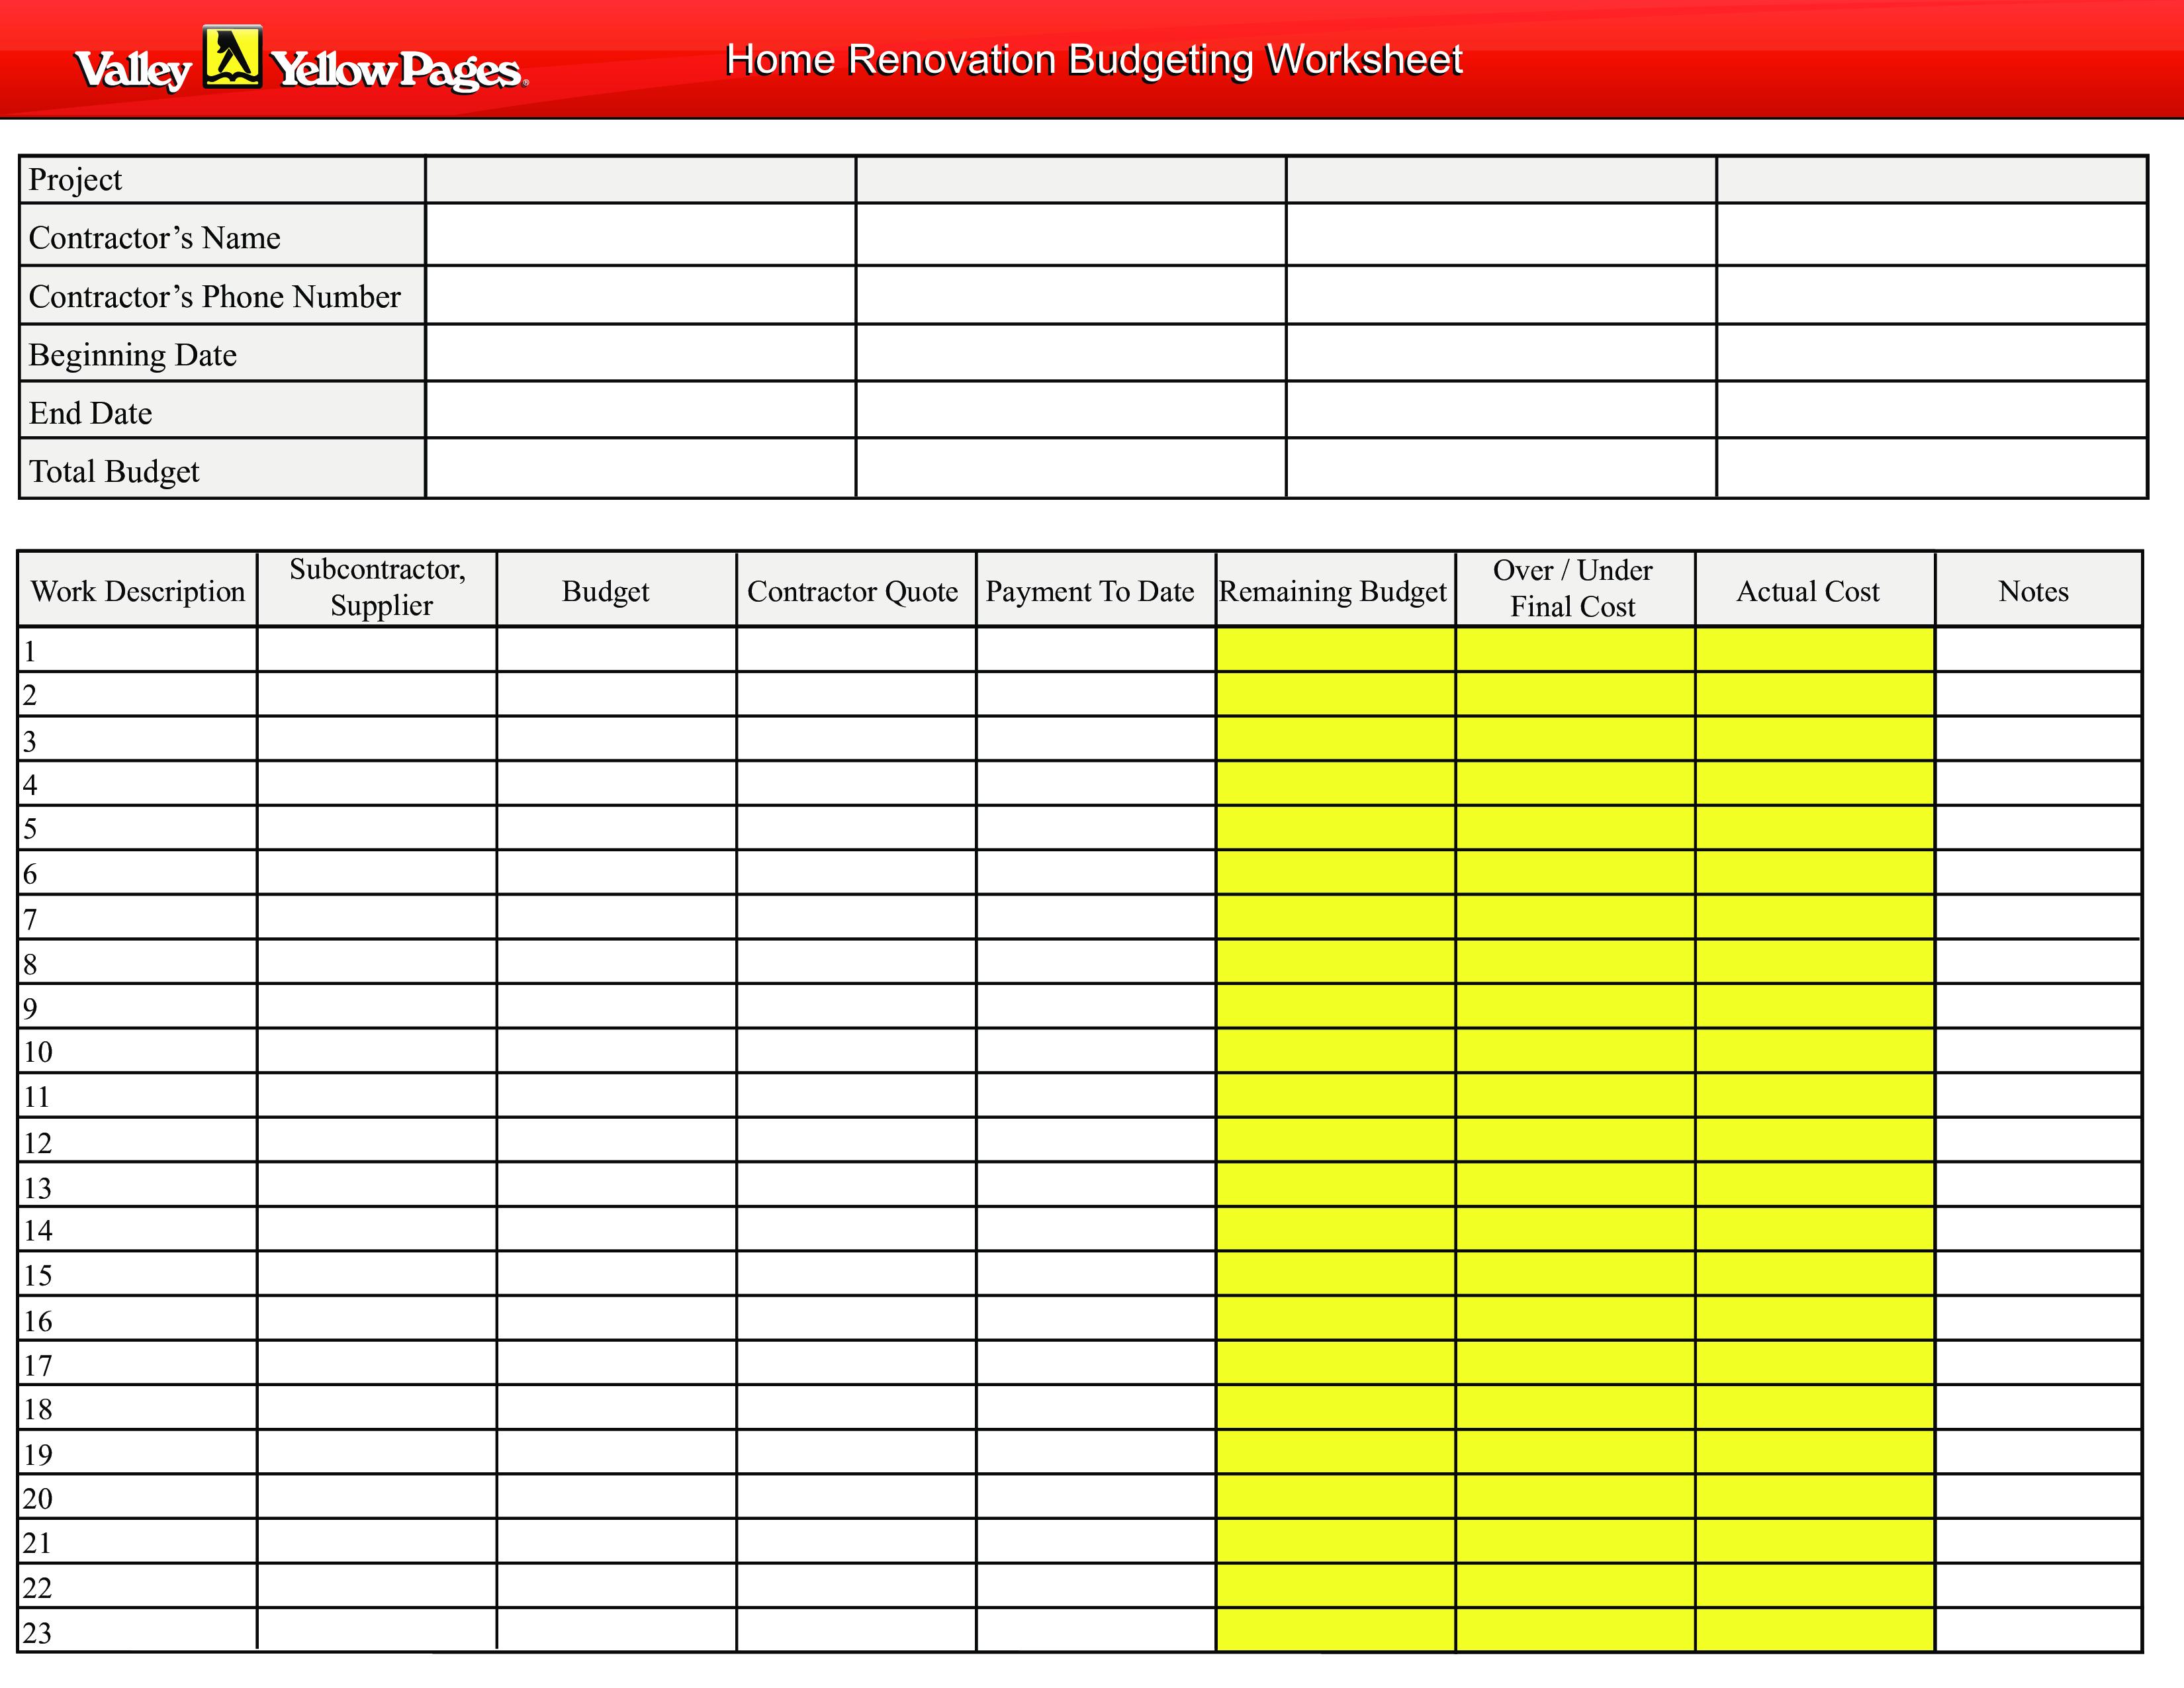 Home Renovation Budget Worksheet Templates At